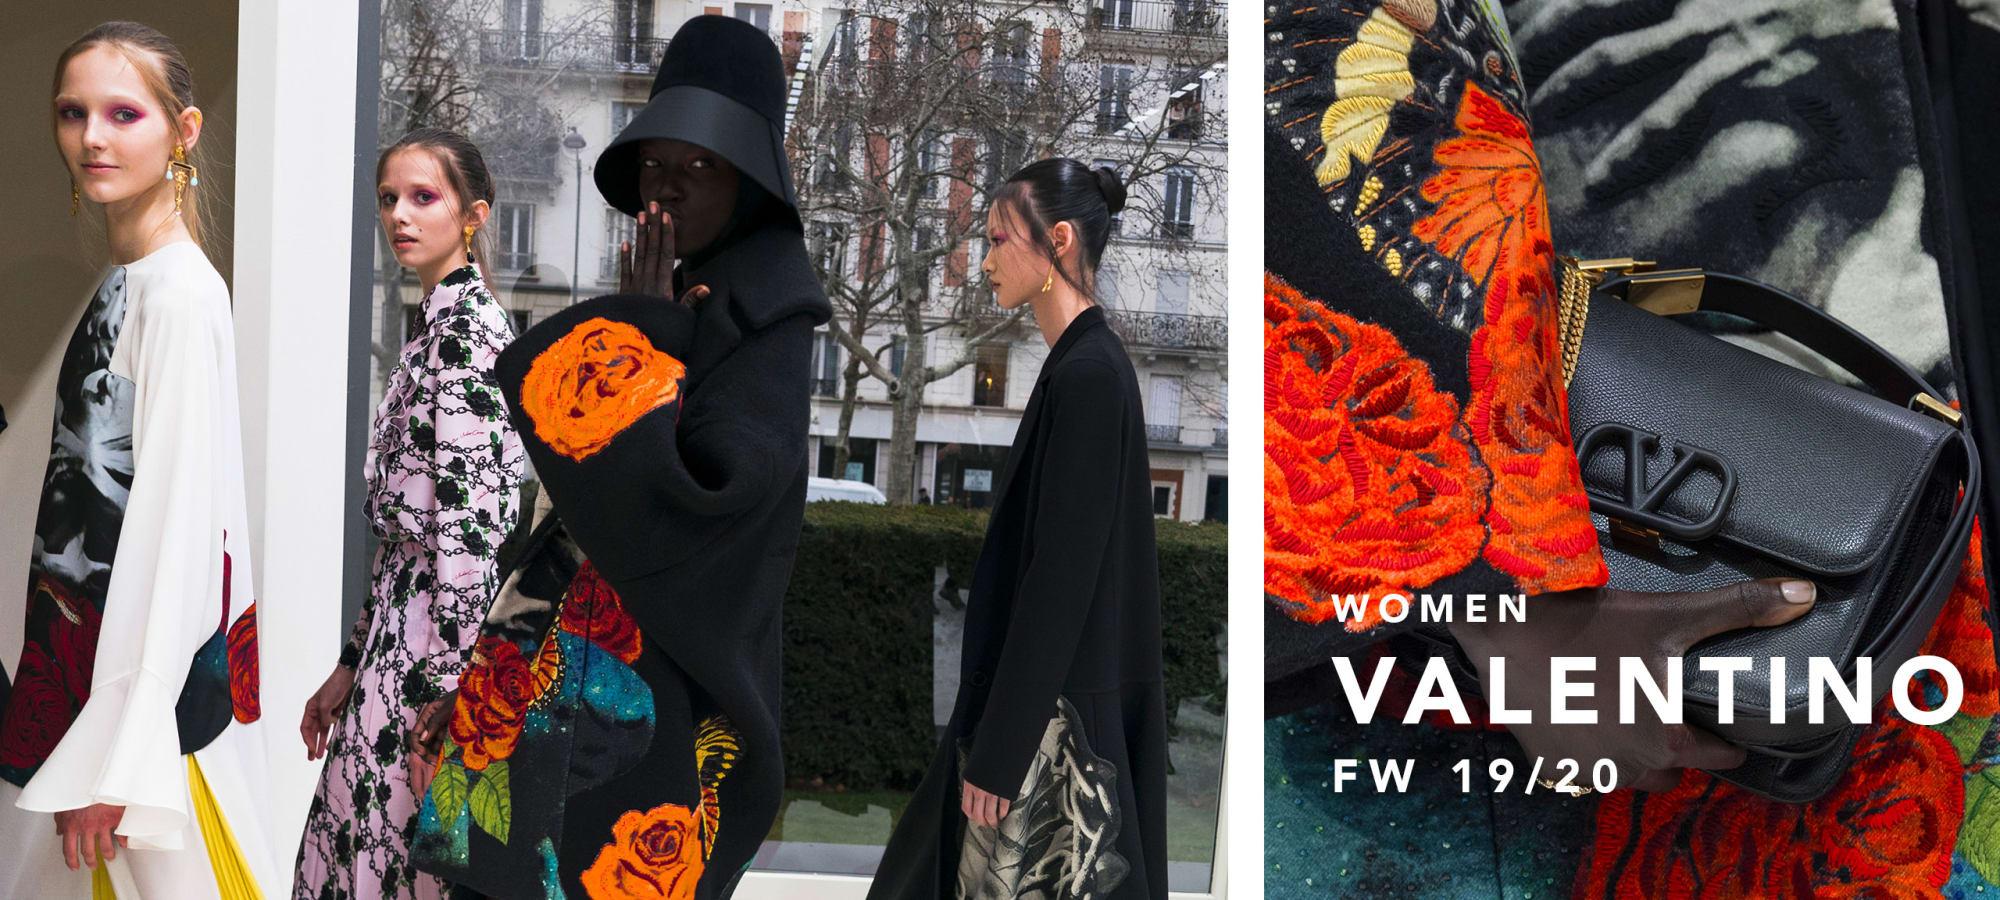 Valentino Women Fall Winter 19/20 by italist